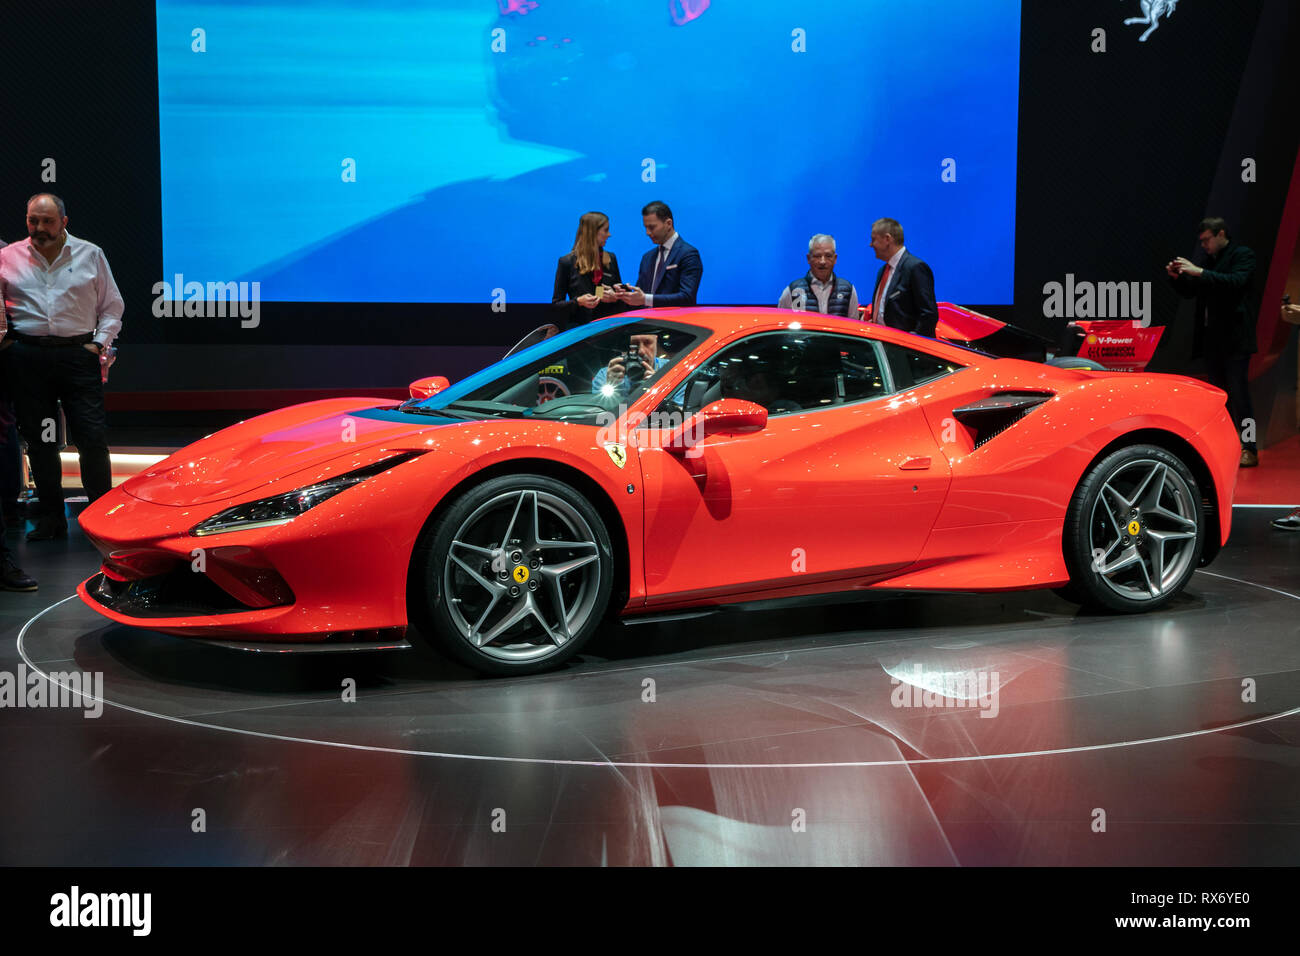 GENEVA, SWITZERLAND - MARCH 6, 2019: New Ferrari F8 Tributo sports car reveiled at the 89th Geneva International Motor Show. - Stock Image